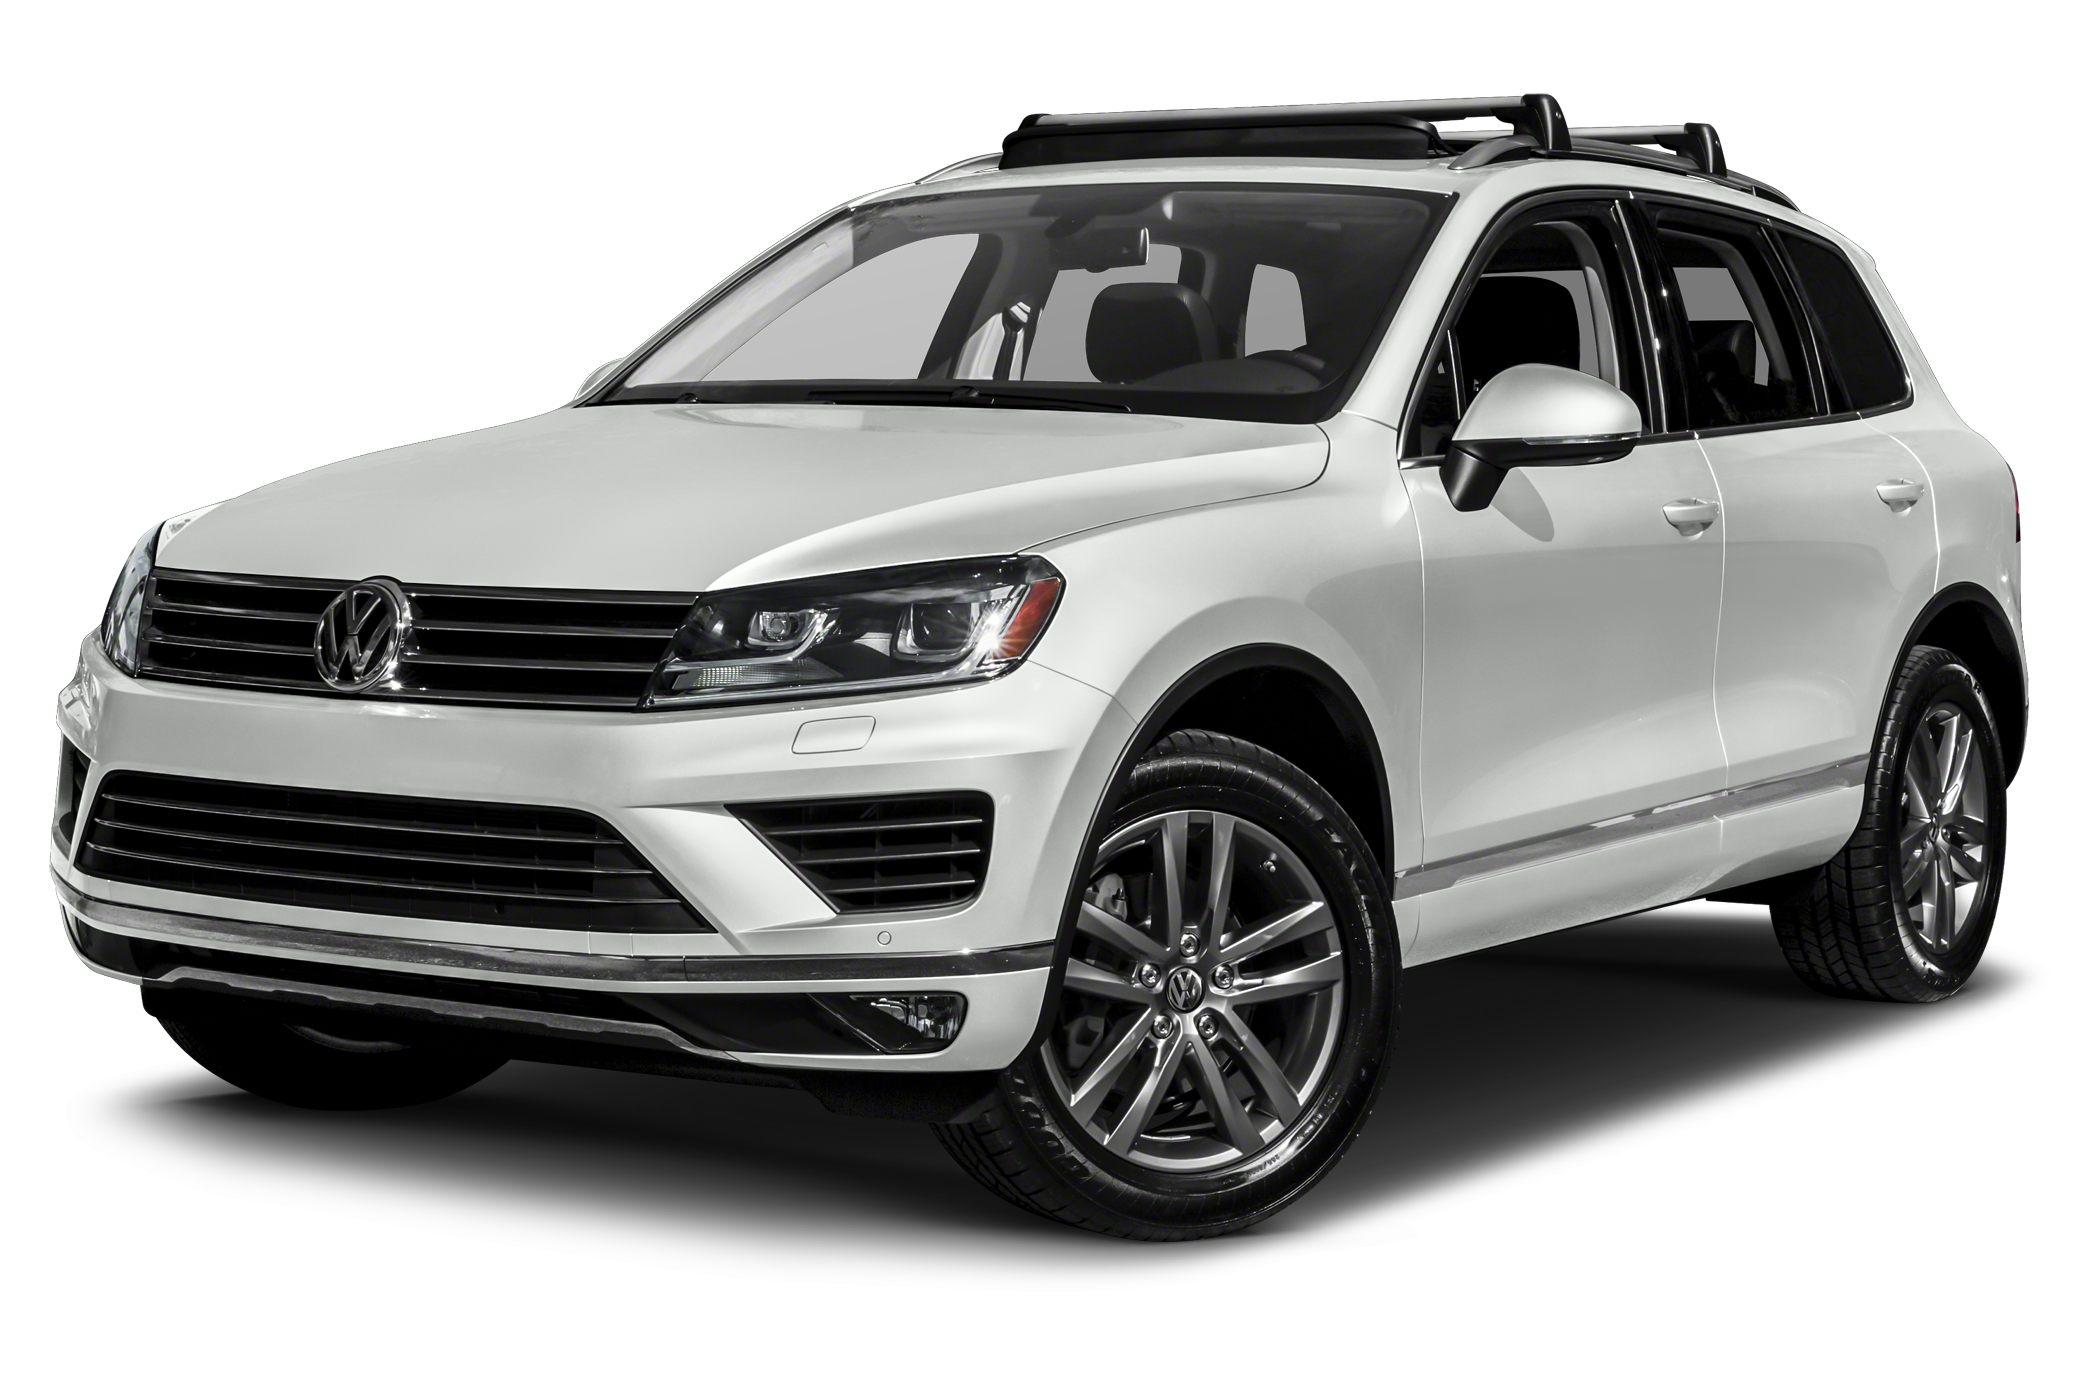 2015 Volkswagen Touareg Specs Safety Rating Amp Mpg